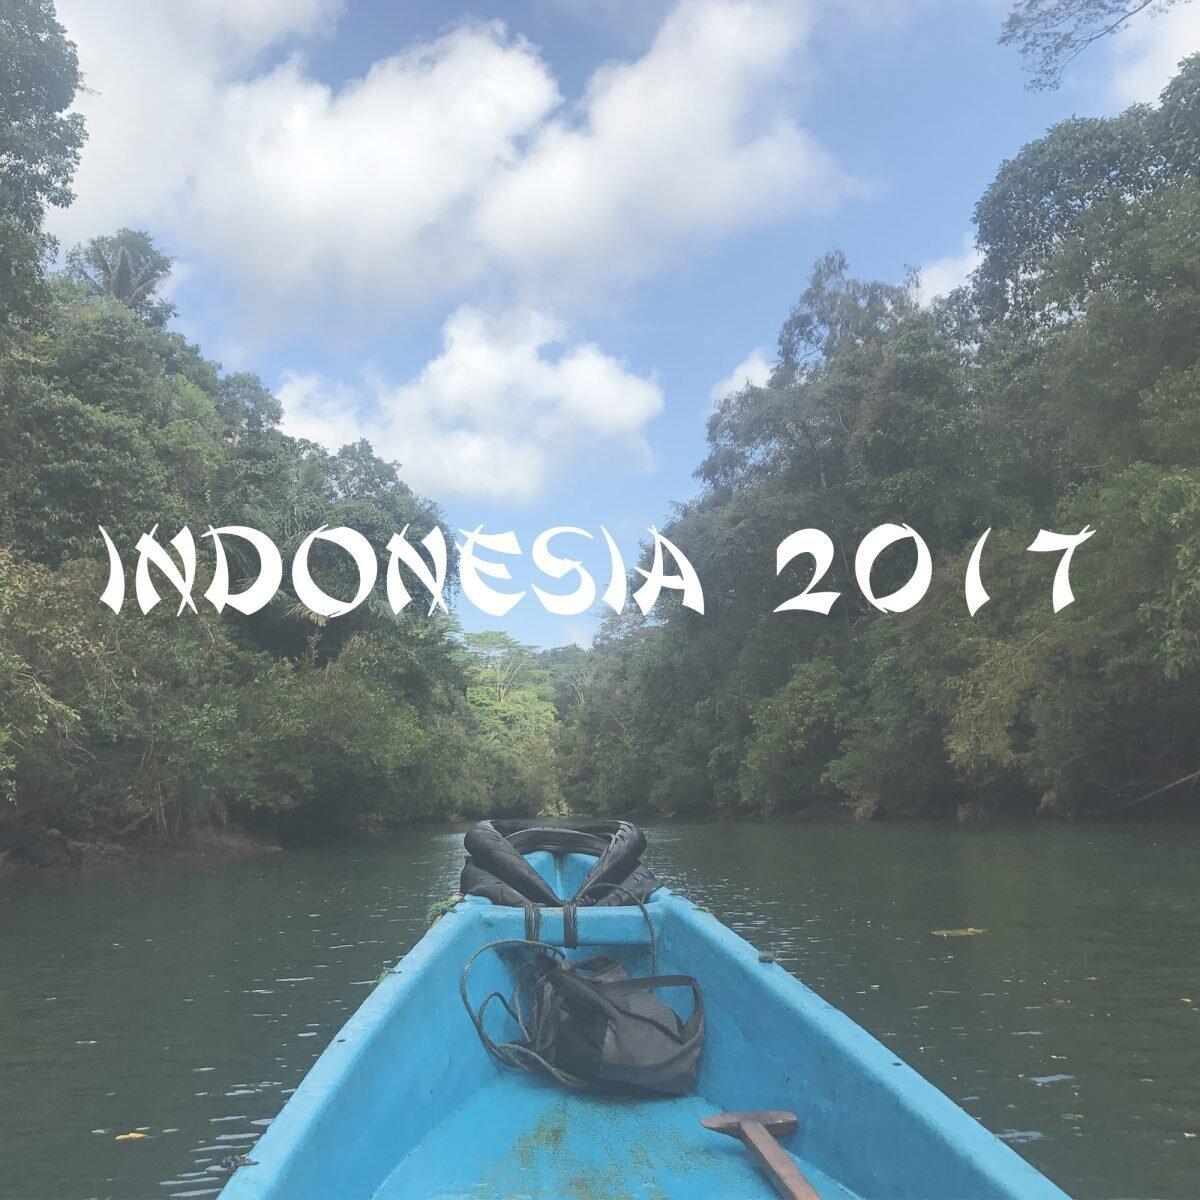 Indonesia 2017: profumi, sapori e pace